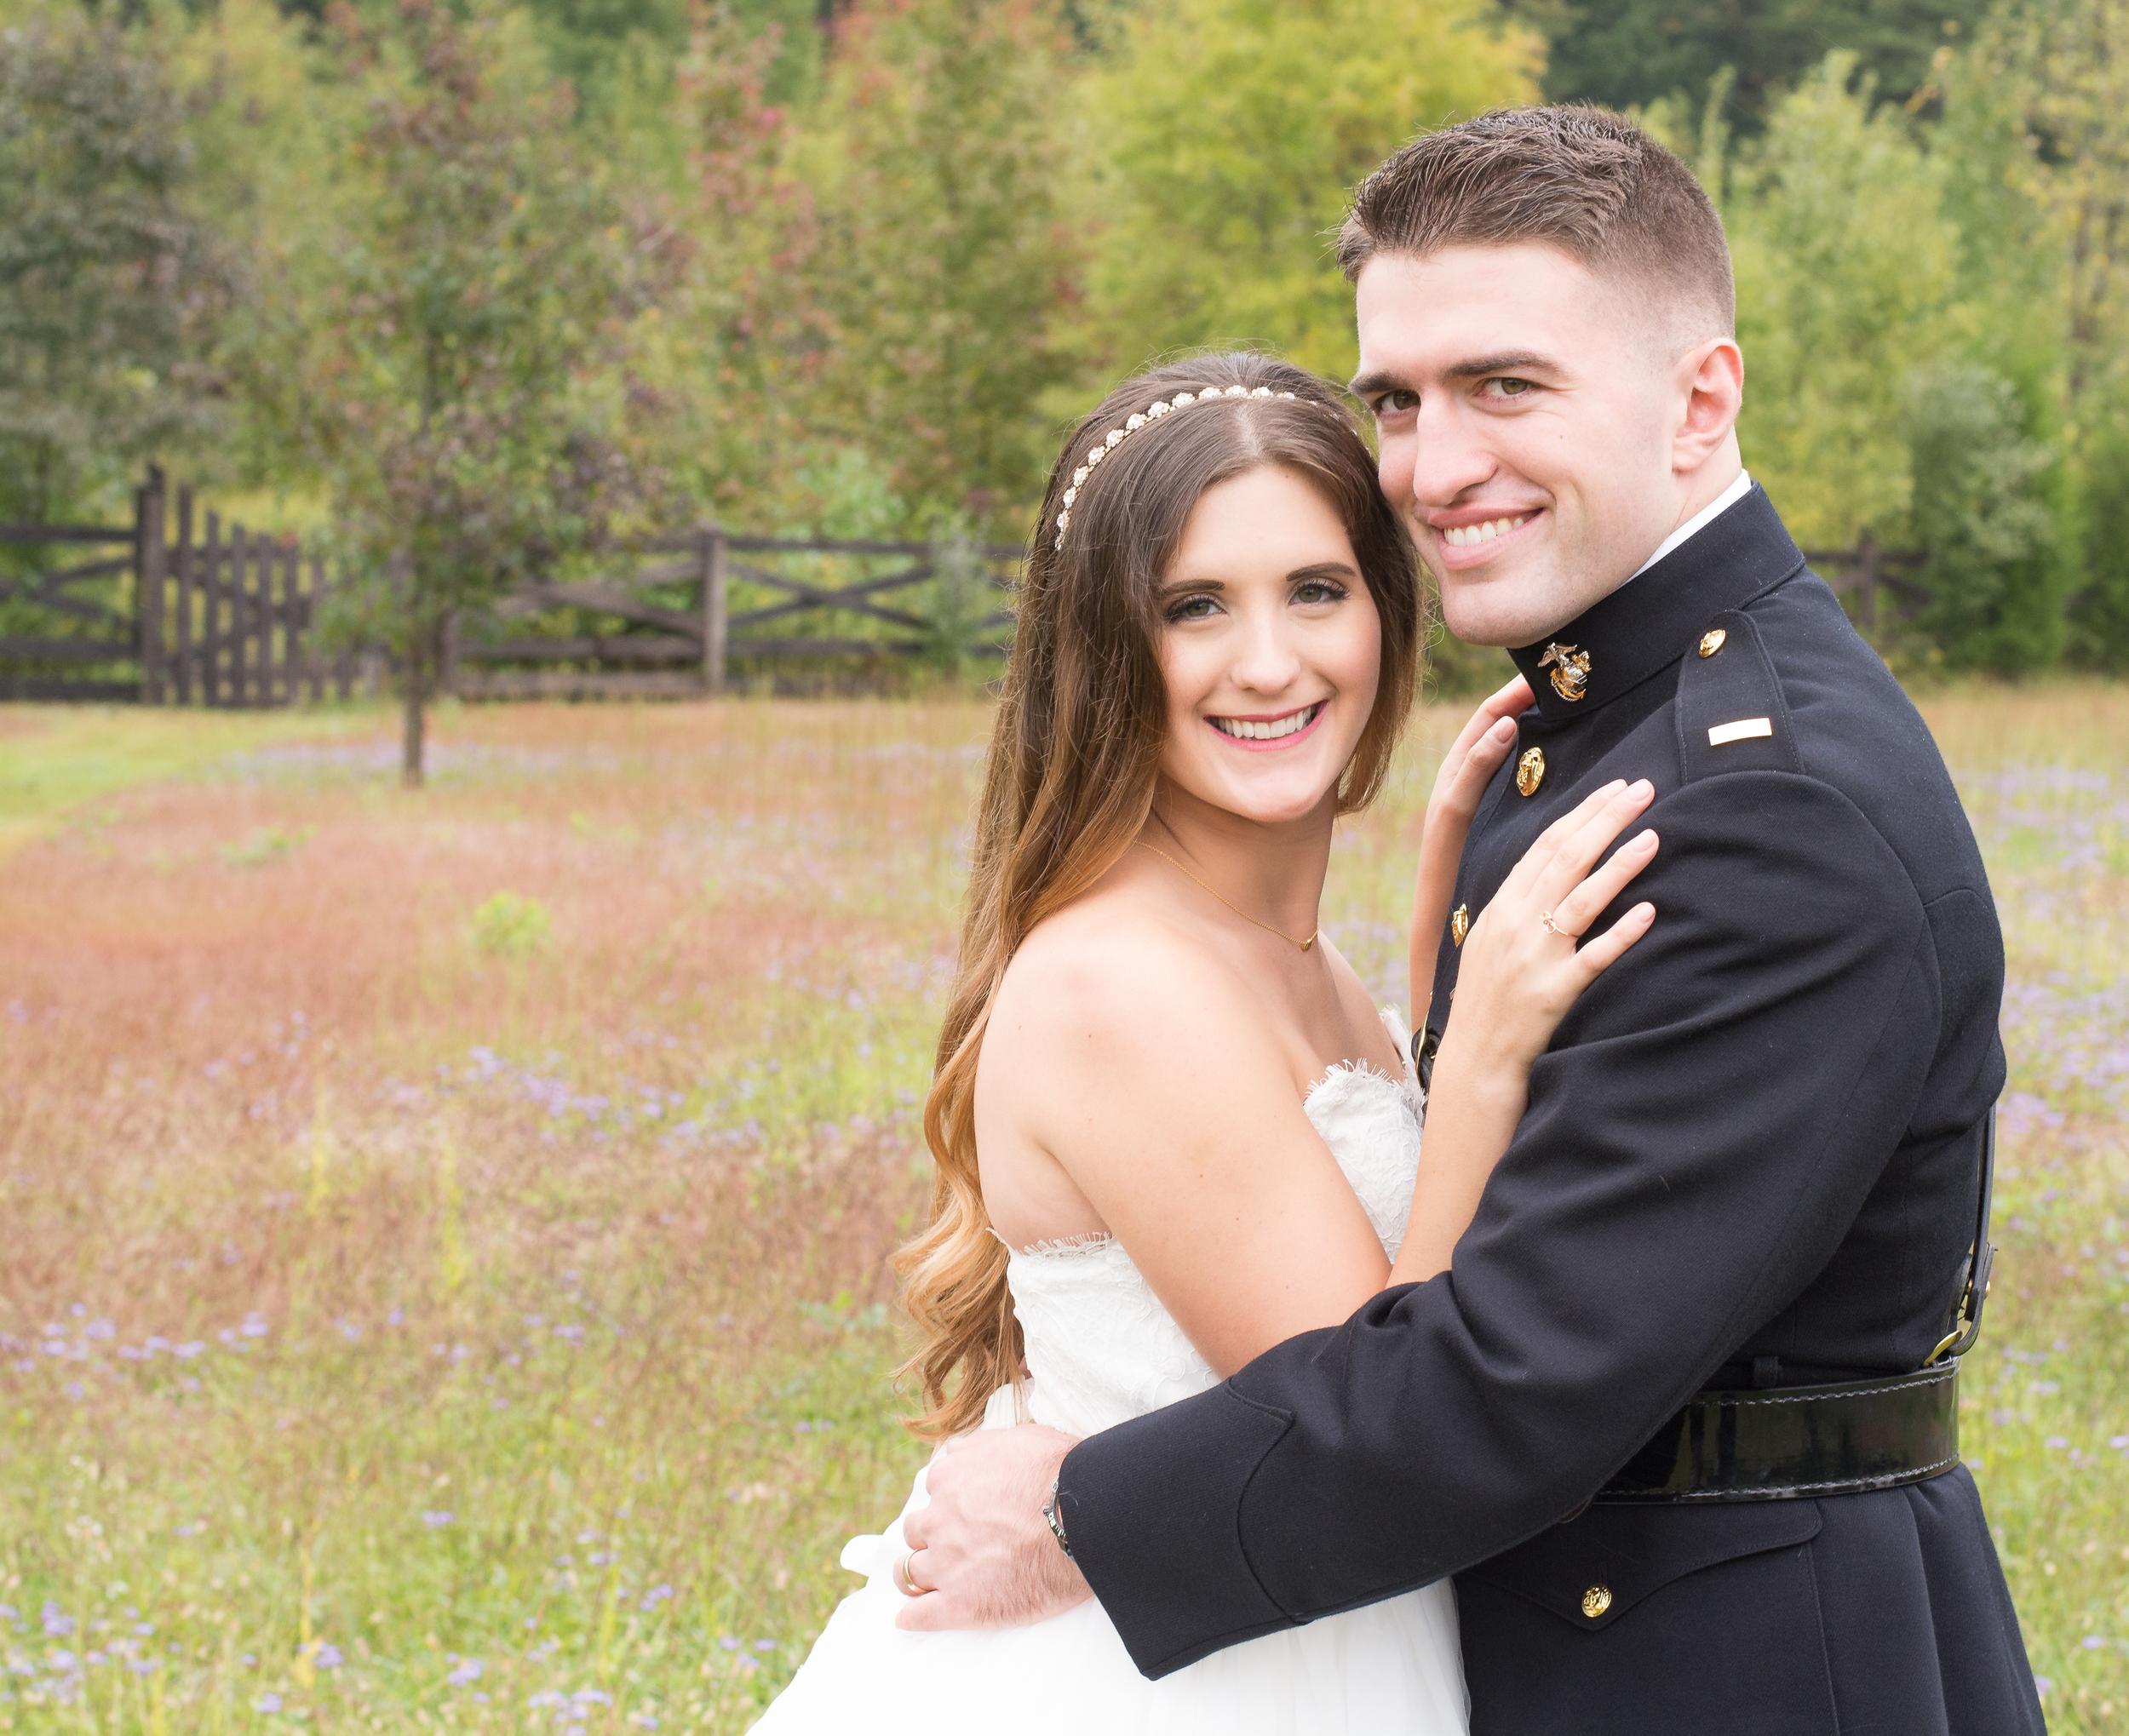 The Glasgow Farm Wedding bride and groom Photo